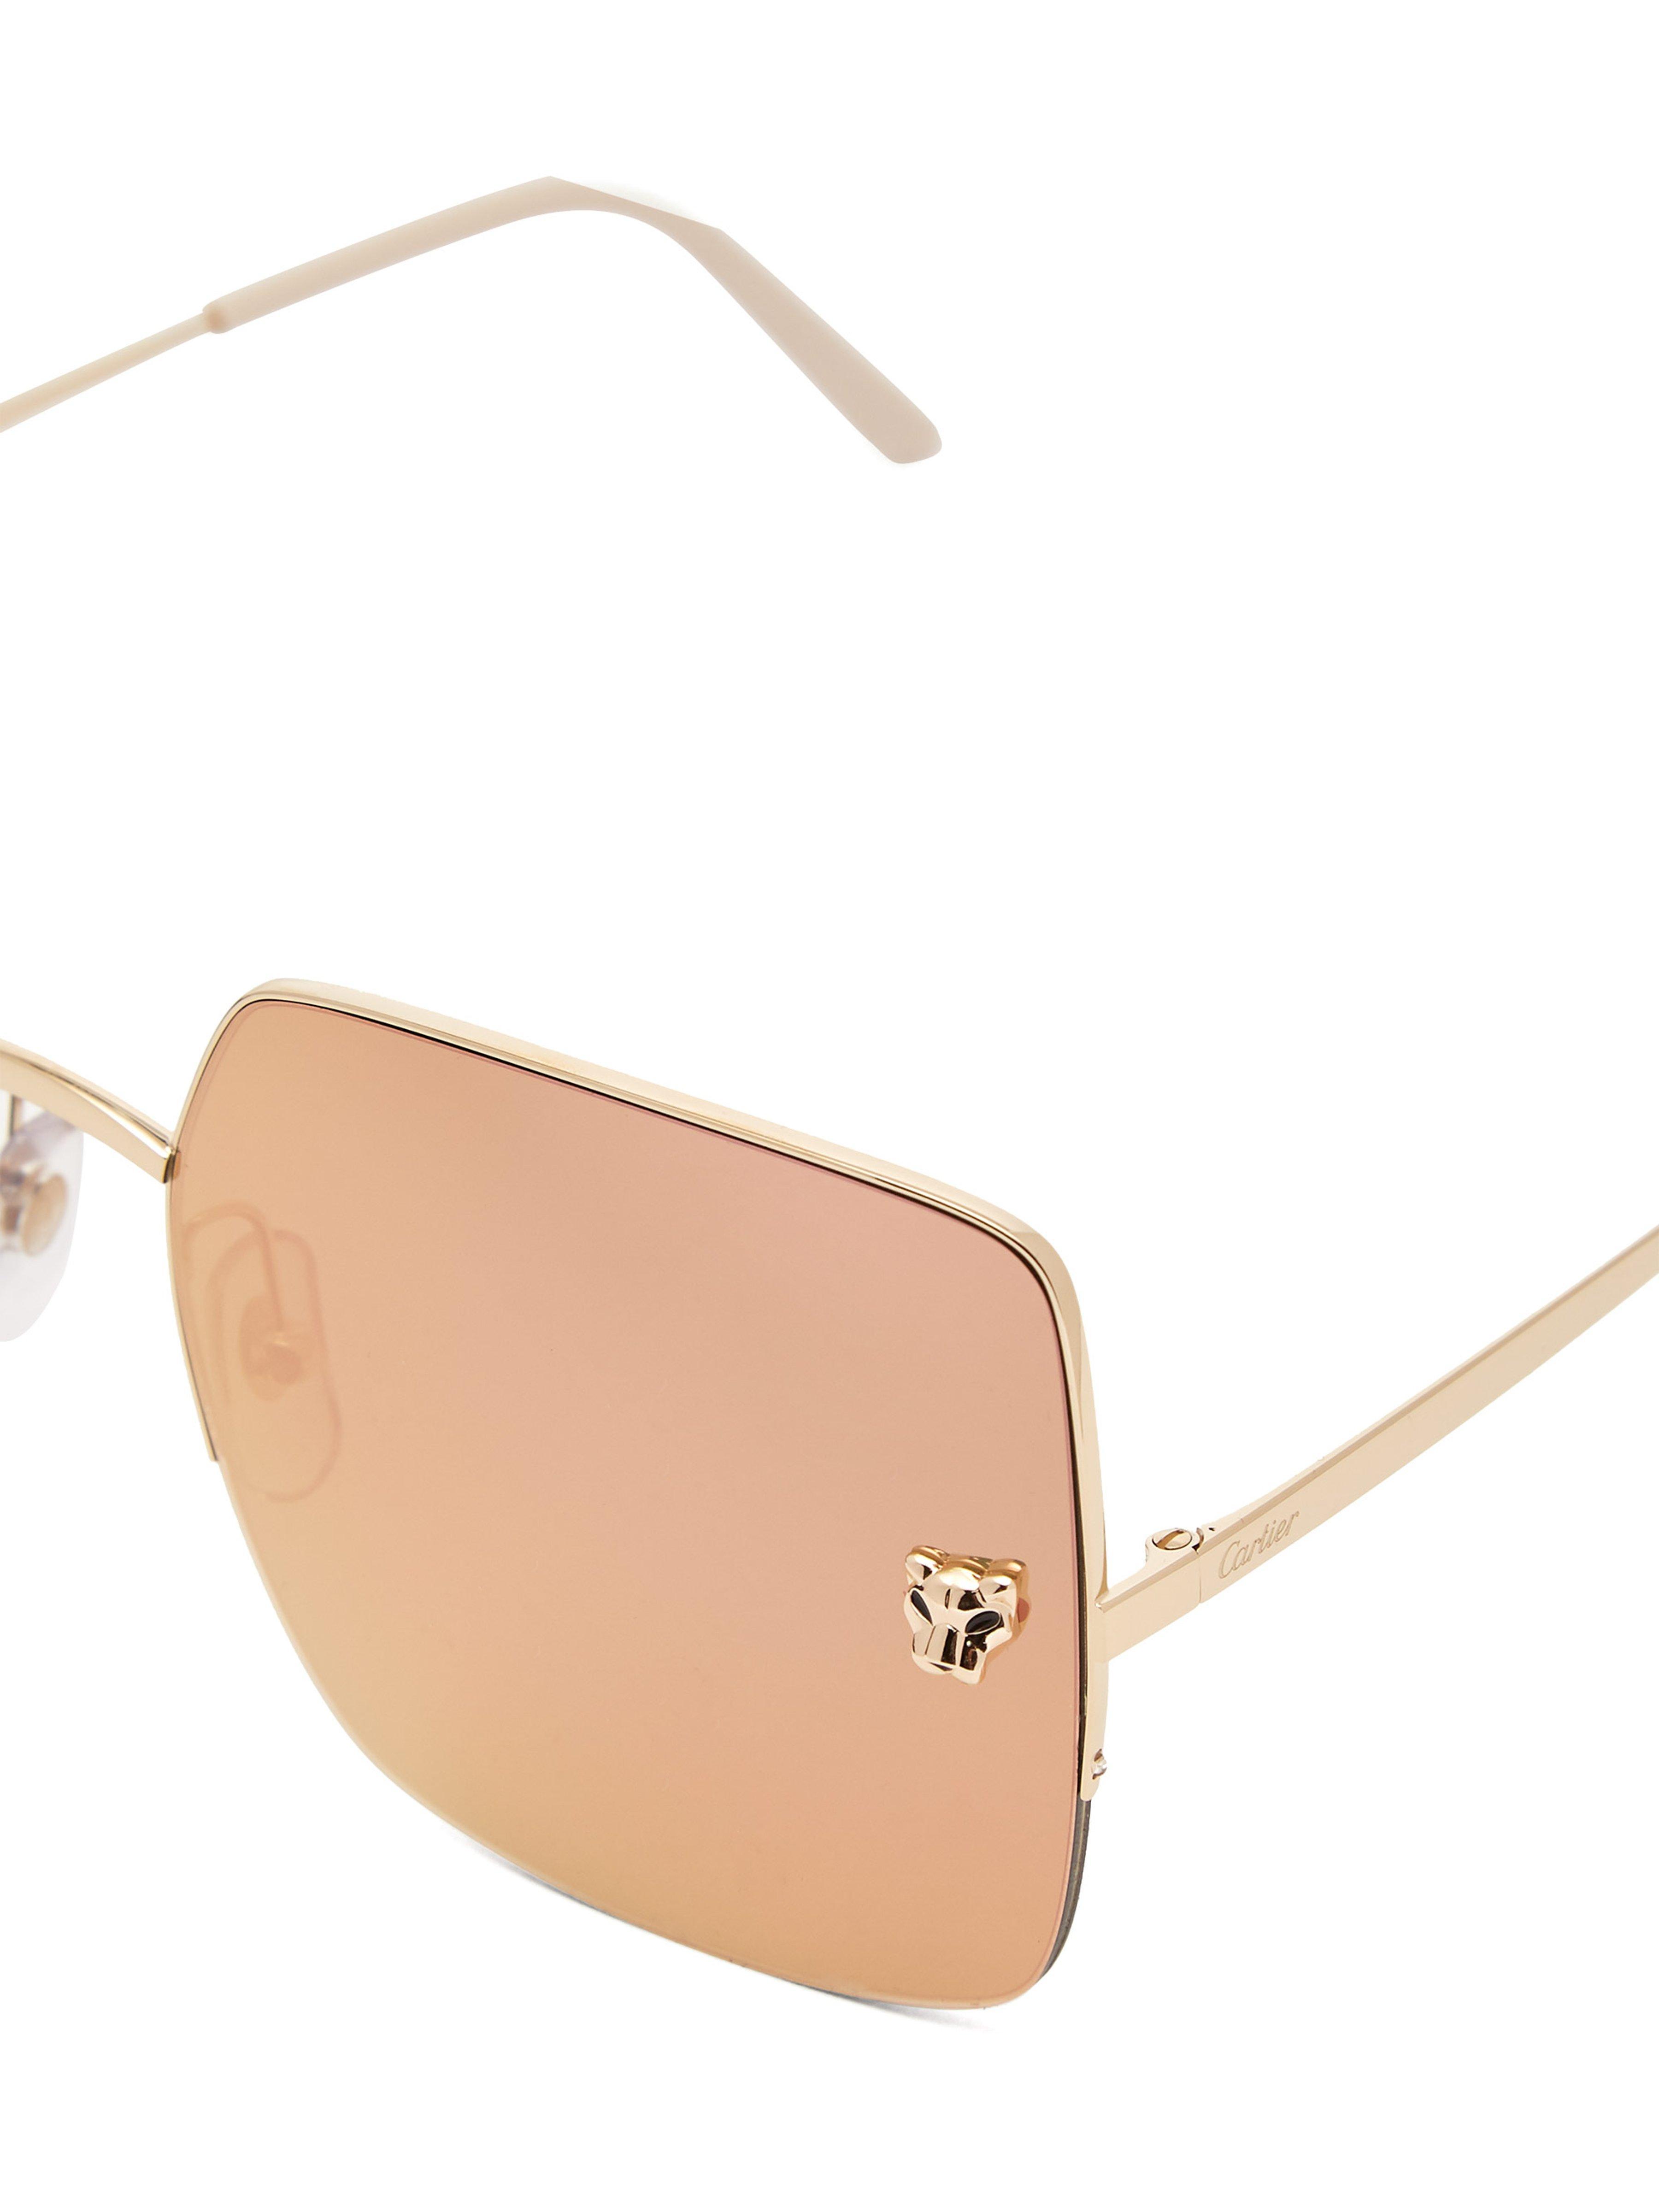 0fde904612f54 Cartier - Metallic Panthère Mirrored Square Lens Sunglasses - Lyst. View  fullscreen